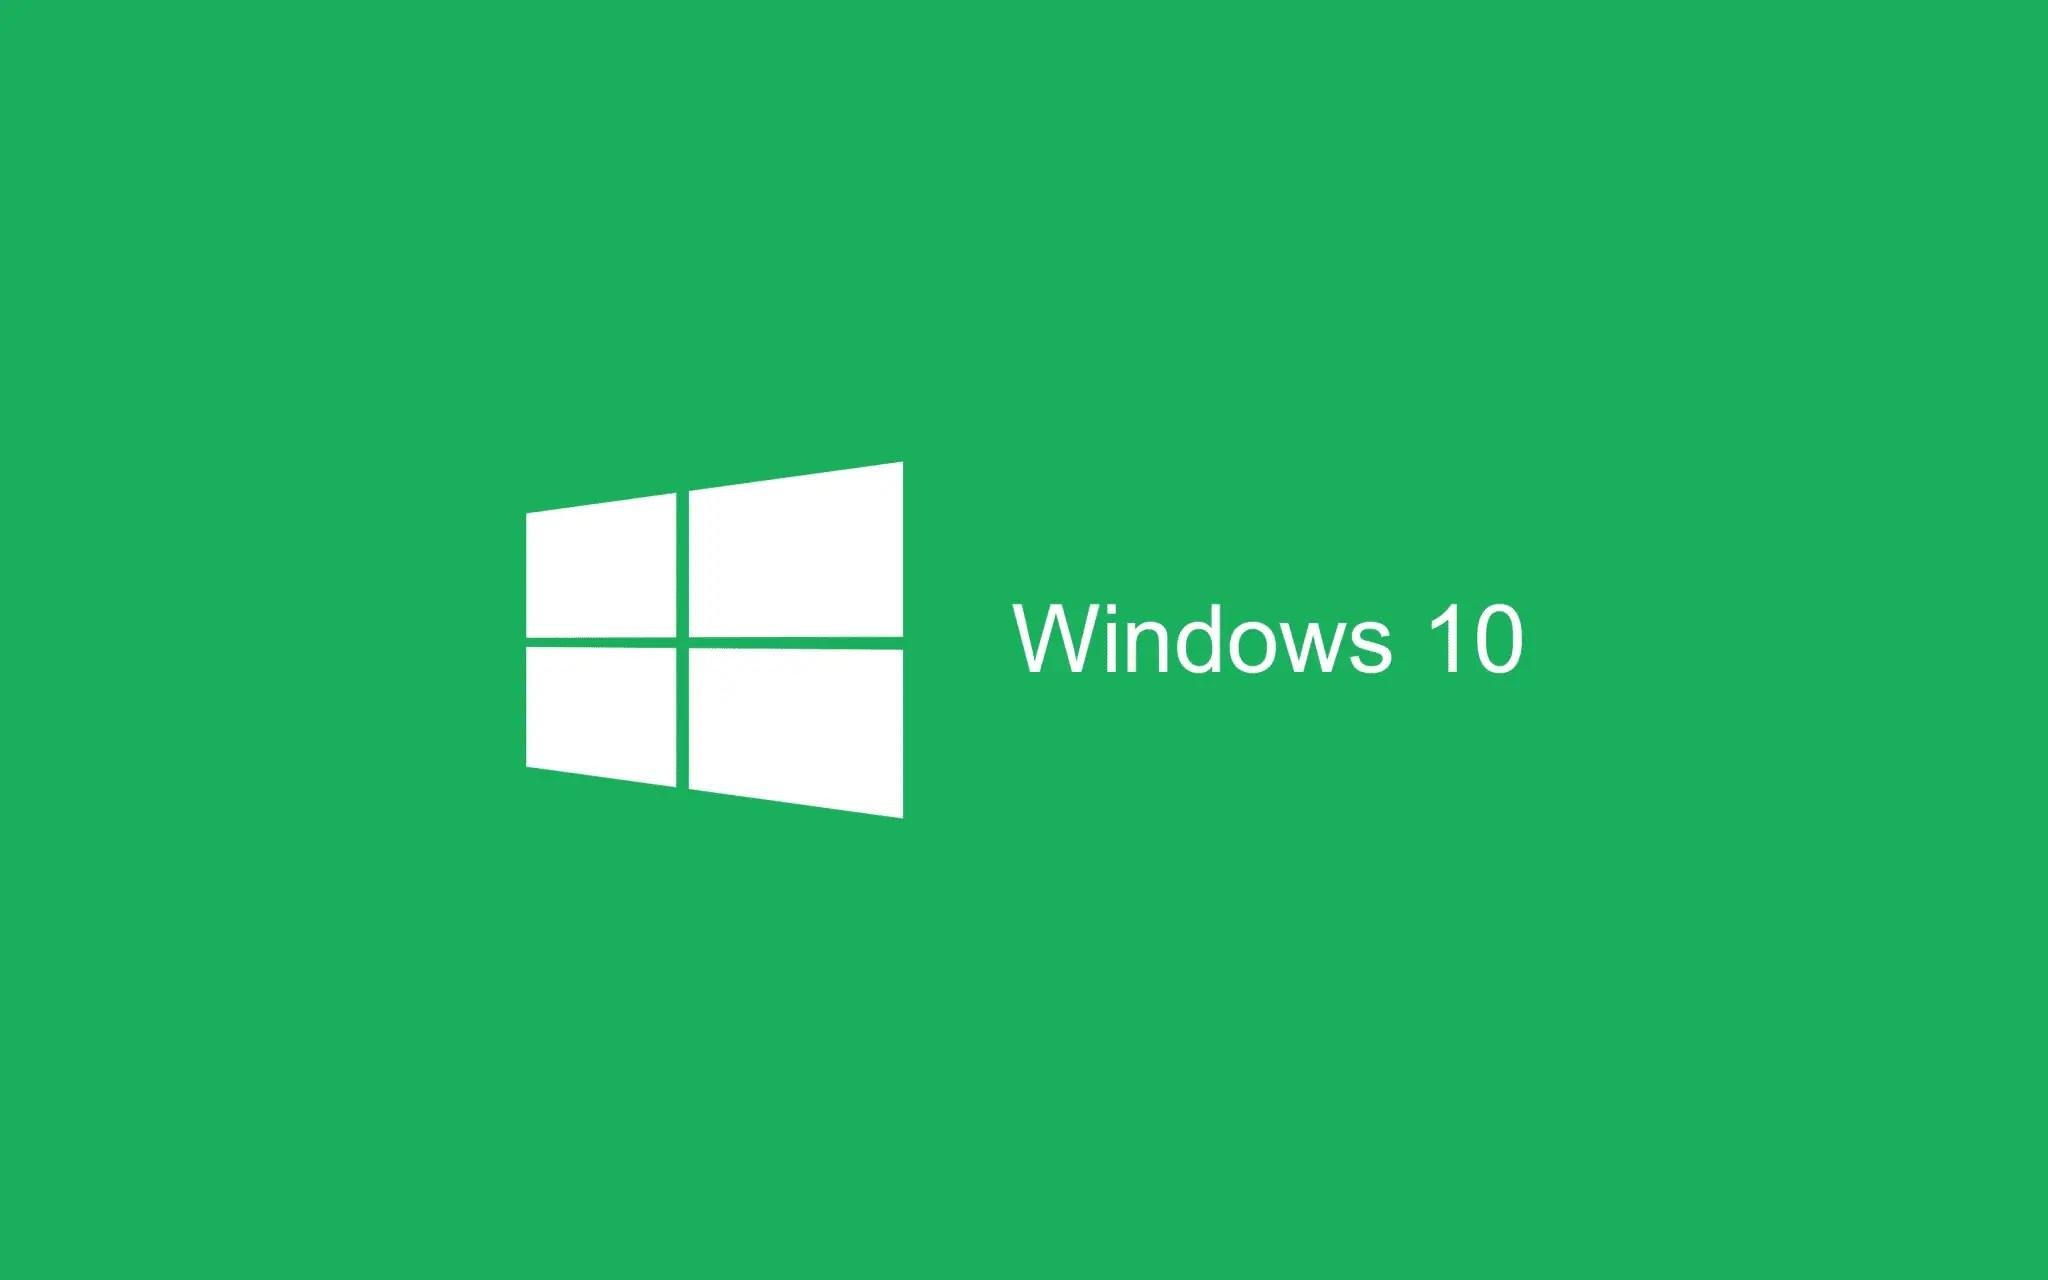 green Wallpaper Windows 10 HD 2880x1800